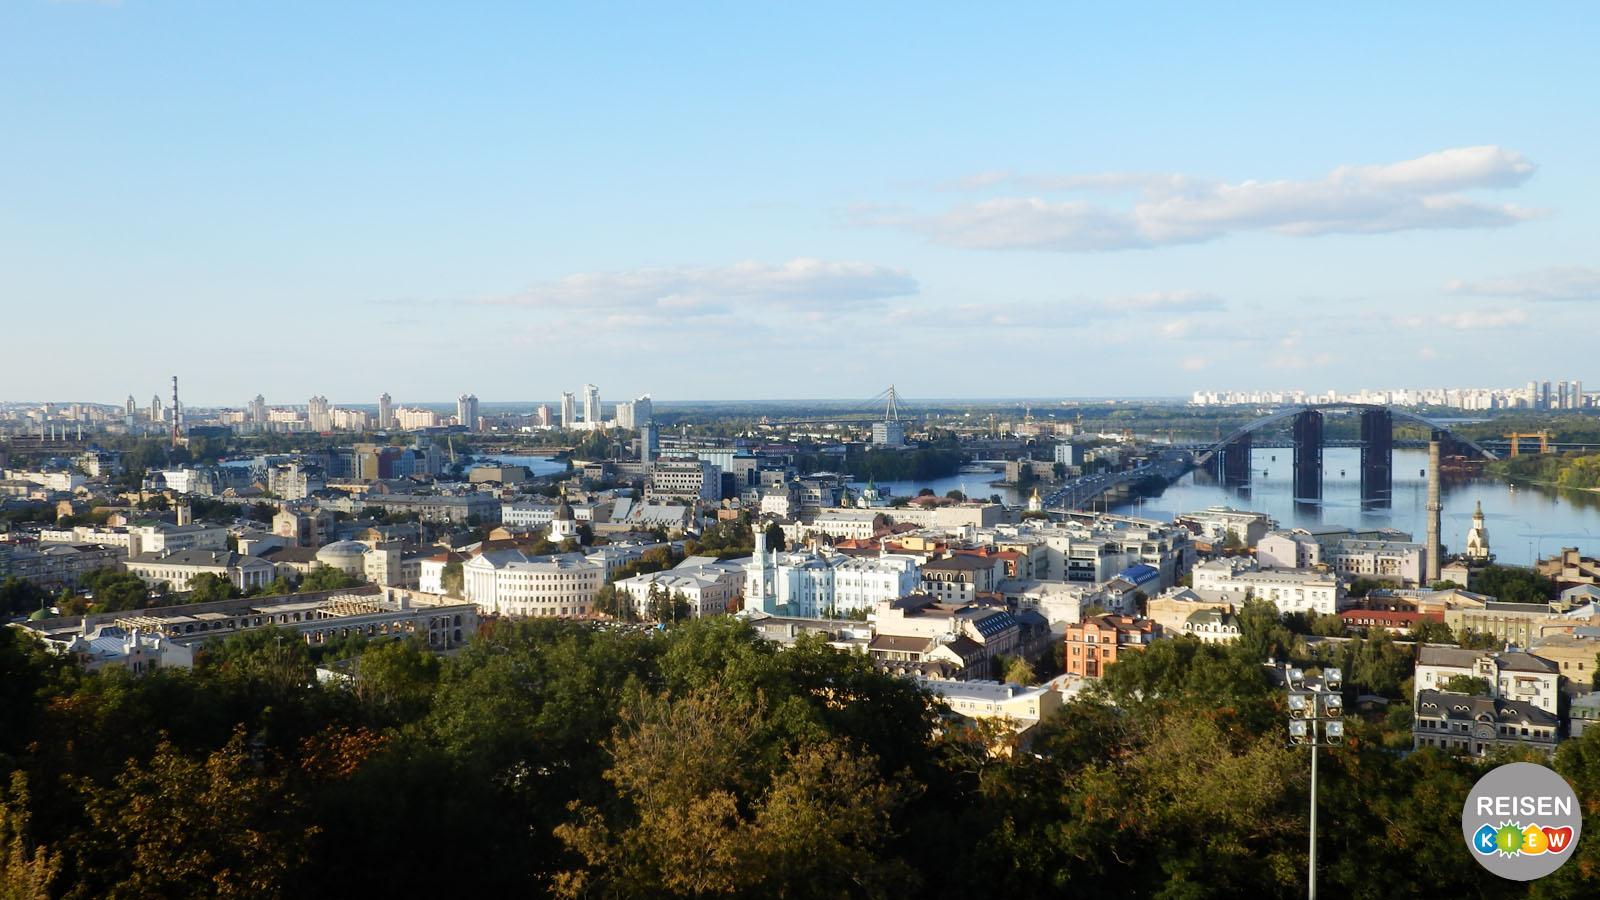 Panoramablick von der Andreaskirche in Kiew